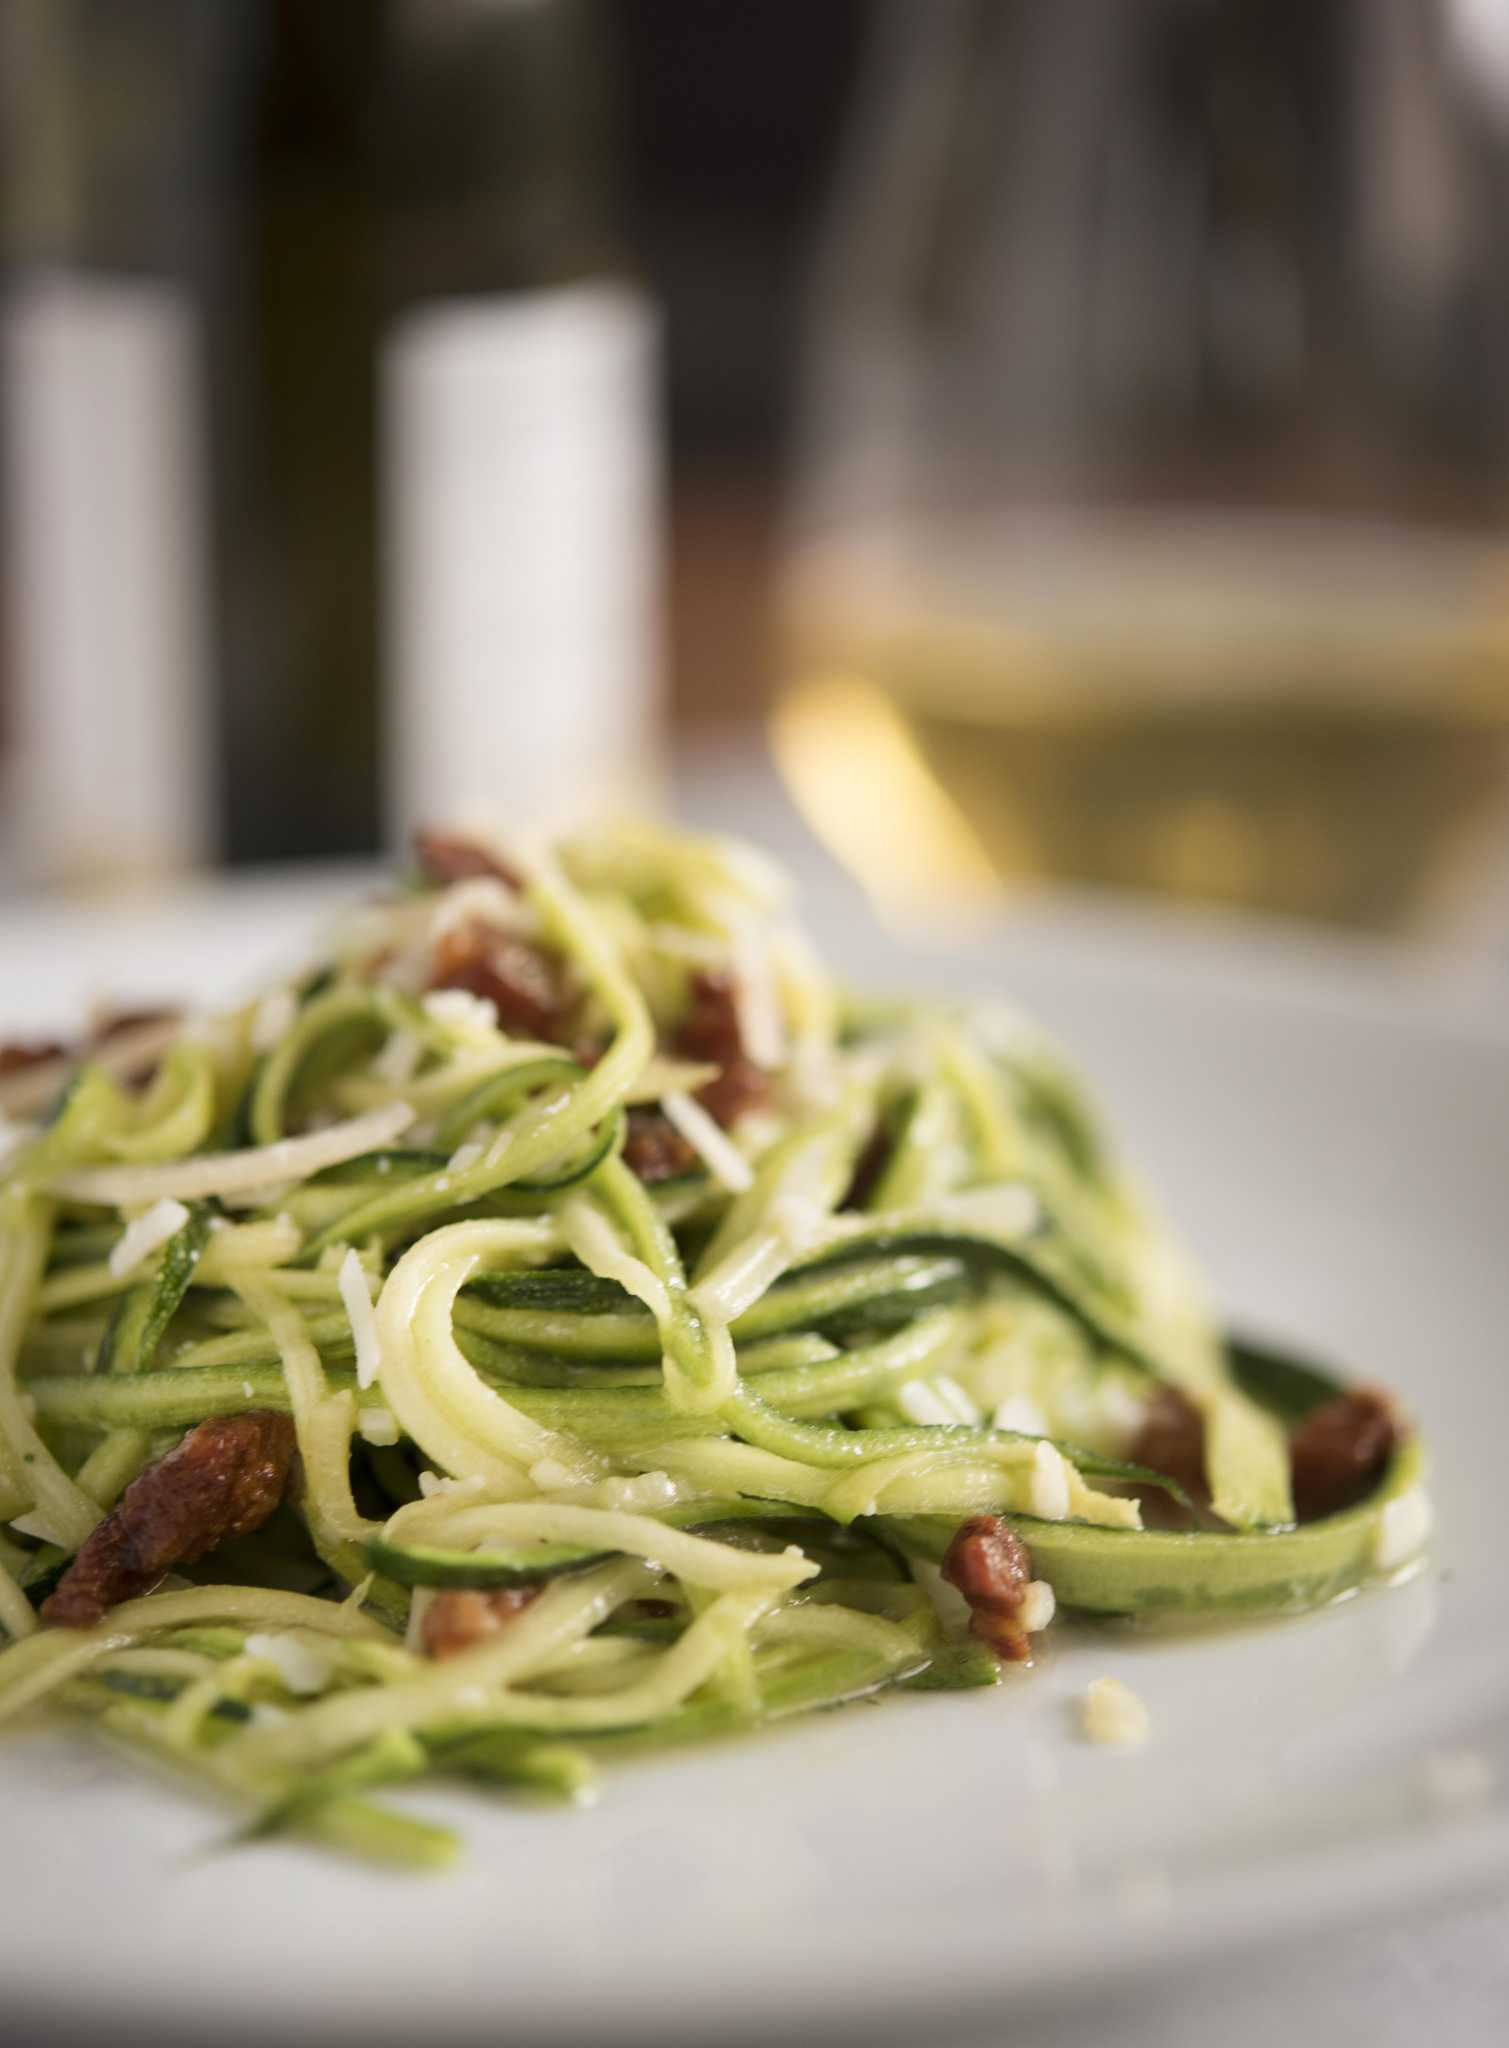 Recipe: Zucchini with Parmesan, pancetta and French lemon vinaigrette